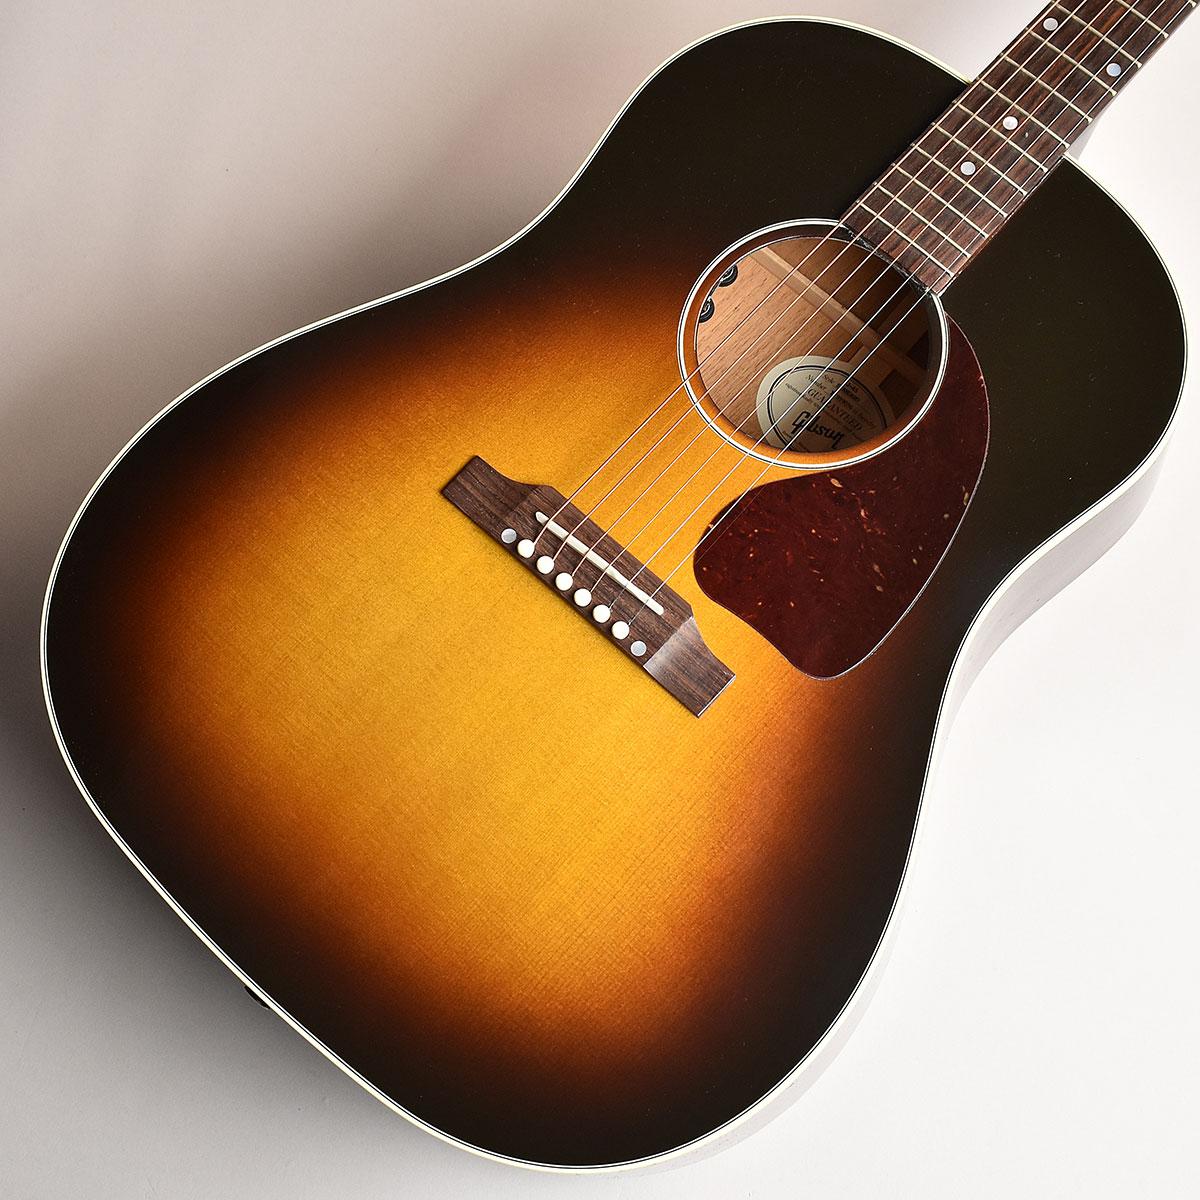 Gibson J-45 Standard 2019 Vintage Sunburst S/N:11939036 エレアコ 【ギブソン】【未展示品】